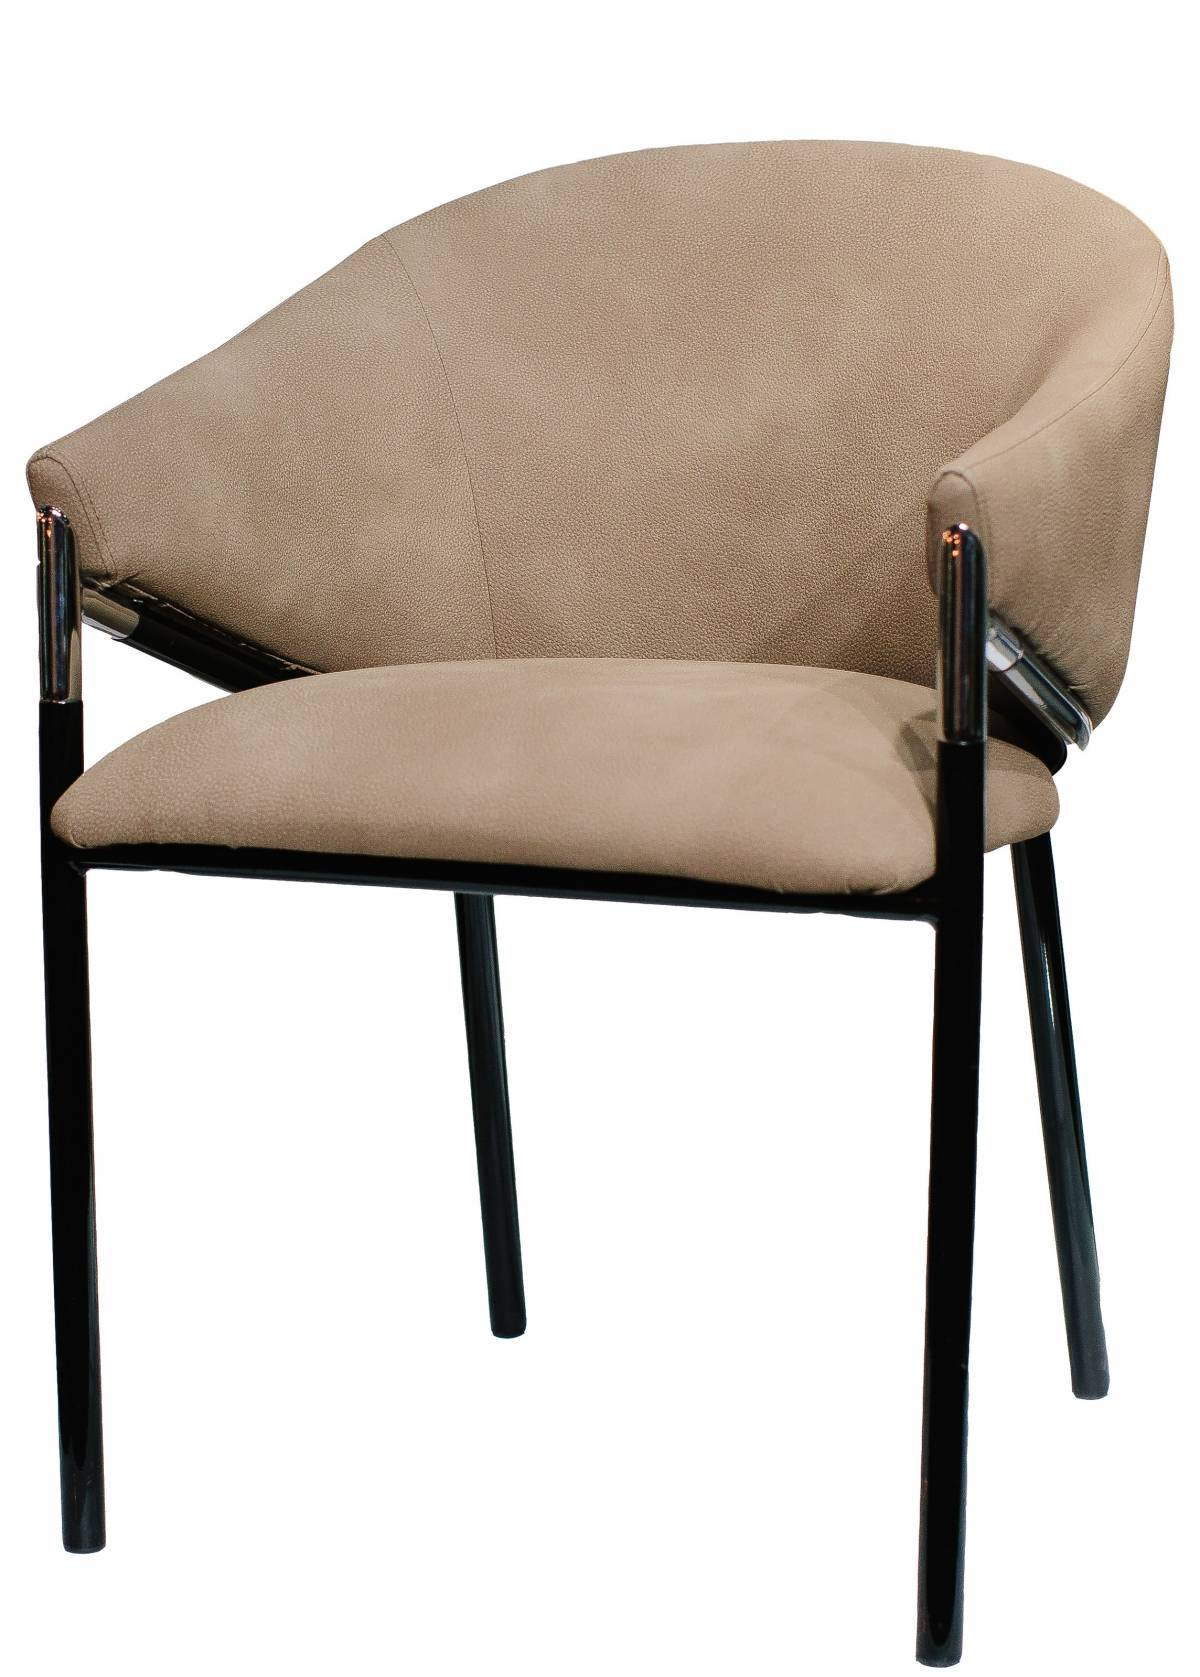 Металлический стул Melody в Raroom картинка